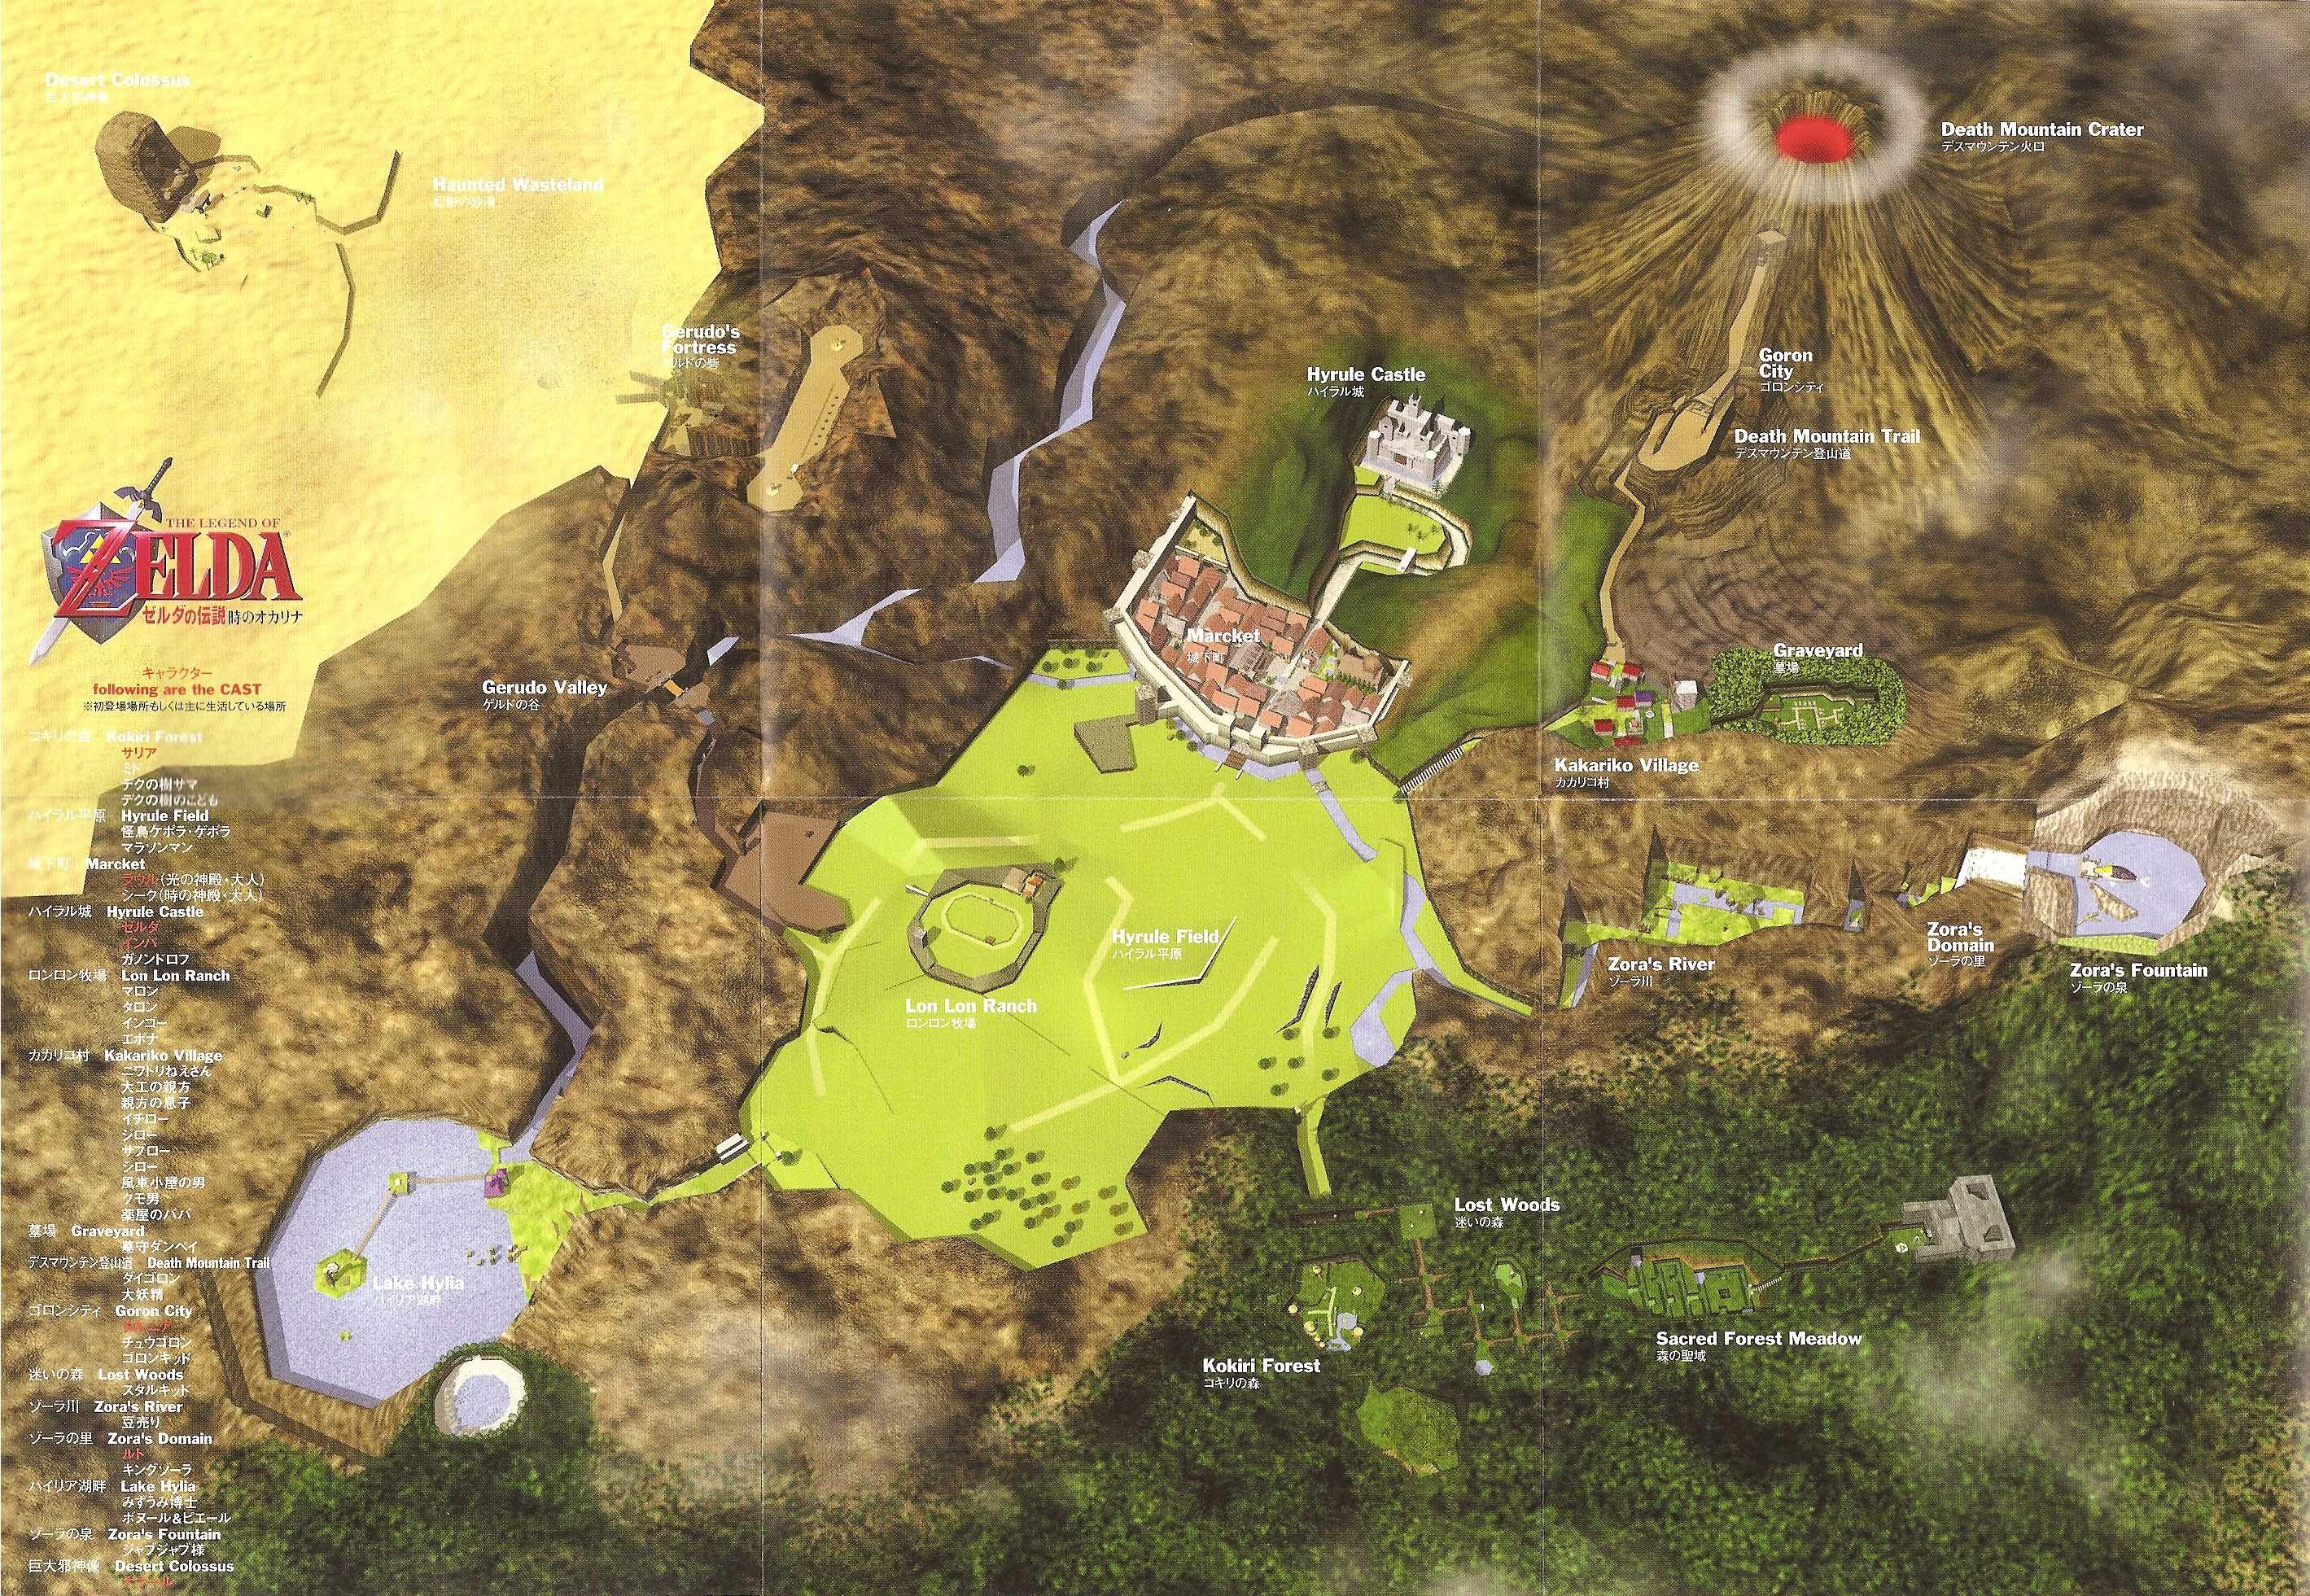 Rare beta map of OoT overworld, sans the cloud coverage. Among other Zelda Ocarina Of Time Map on zelda wind waker bad guys, zelda 1 dungeon locations, zelda game map, the legend of zelda map, zelda wind waker map, zelda majora's mask masks, zelda majora's mask wallpaper, zelda map poster, majora's mask map, zelda 1st quest map, zelda majoras mask map, legend of zelda spirit tracks map, zelda dungeon maps, legend of zelda 2 map, zelda spirit temple map, zelda maps secrets, legend of zelda hyrule map, legend of zelda world map, zelda link to the past, zelda nintendo map,